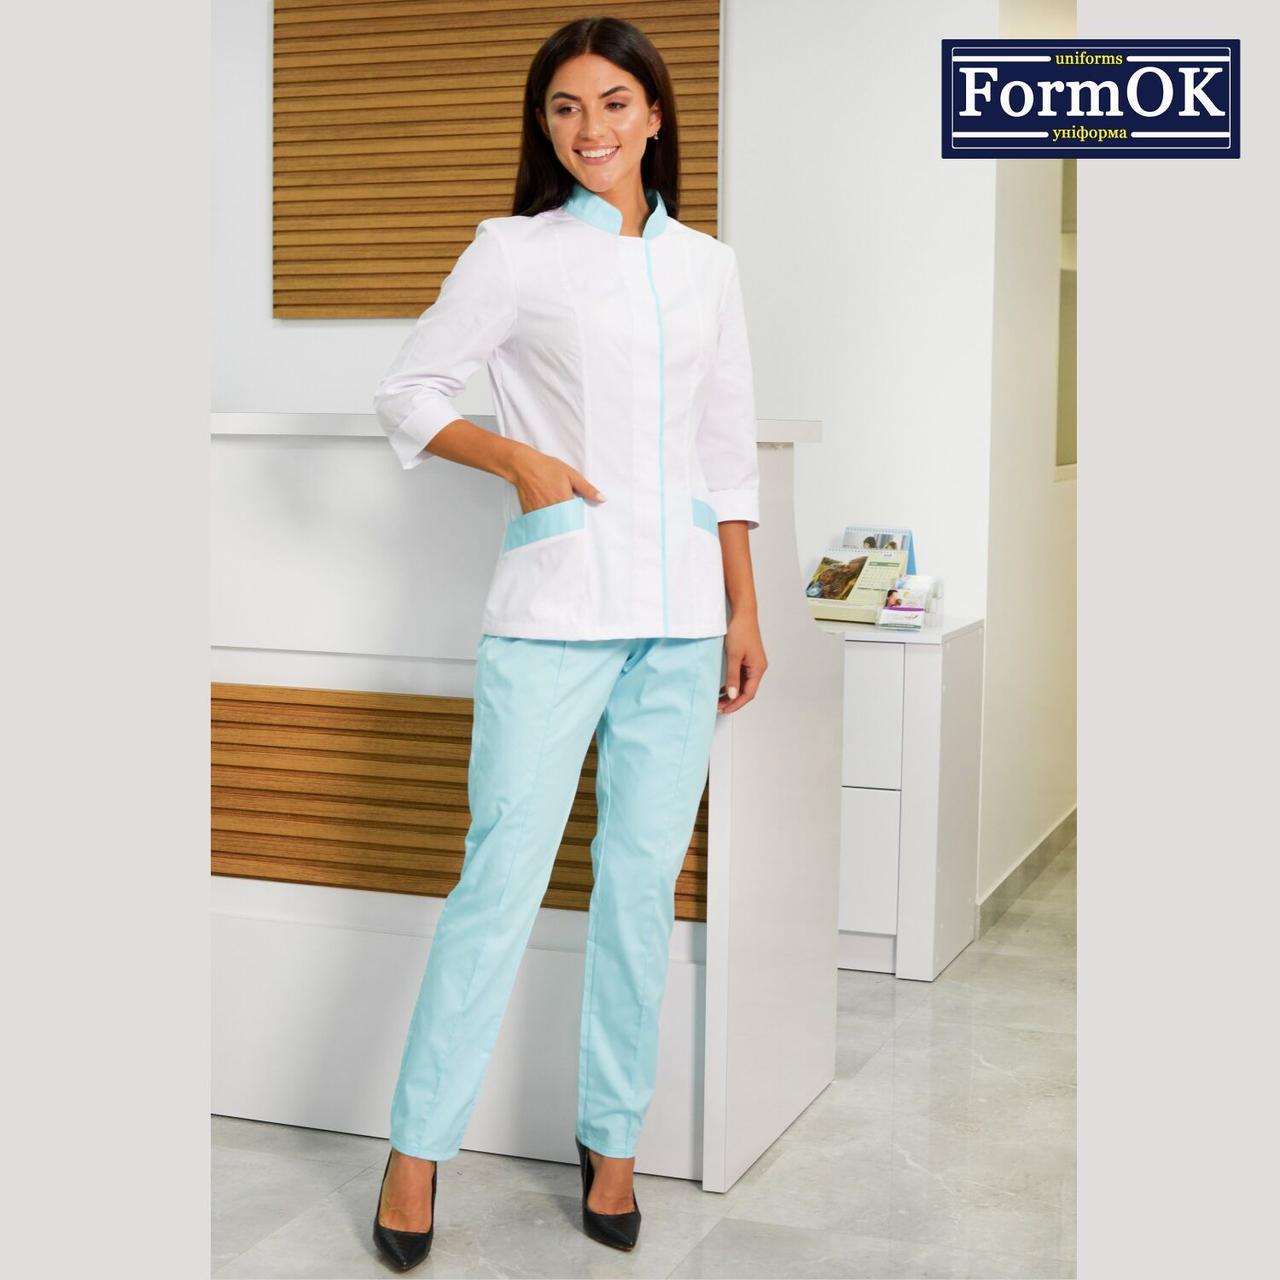 Женские медицинские костюмы Avrora бело-голубой, 46